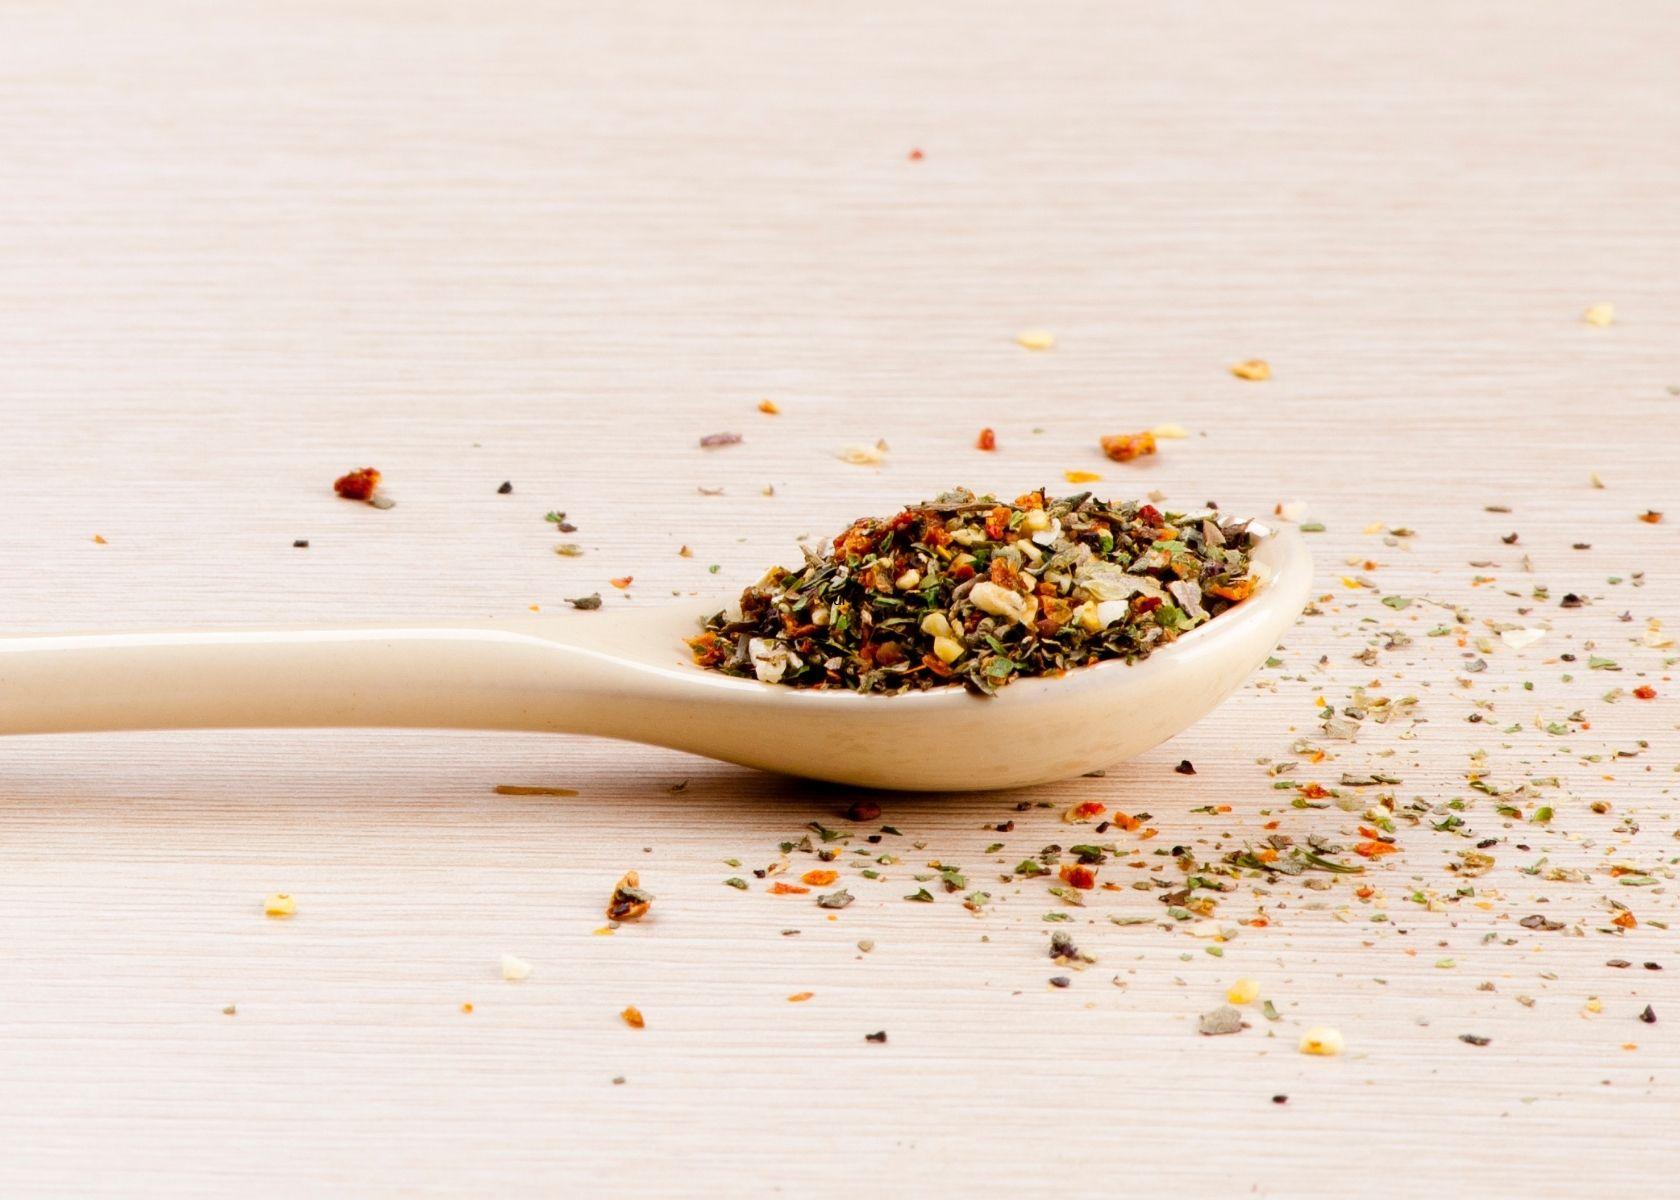 Italian seasoning on wooden spoon. and sprinkled on table.